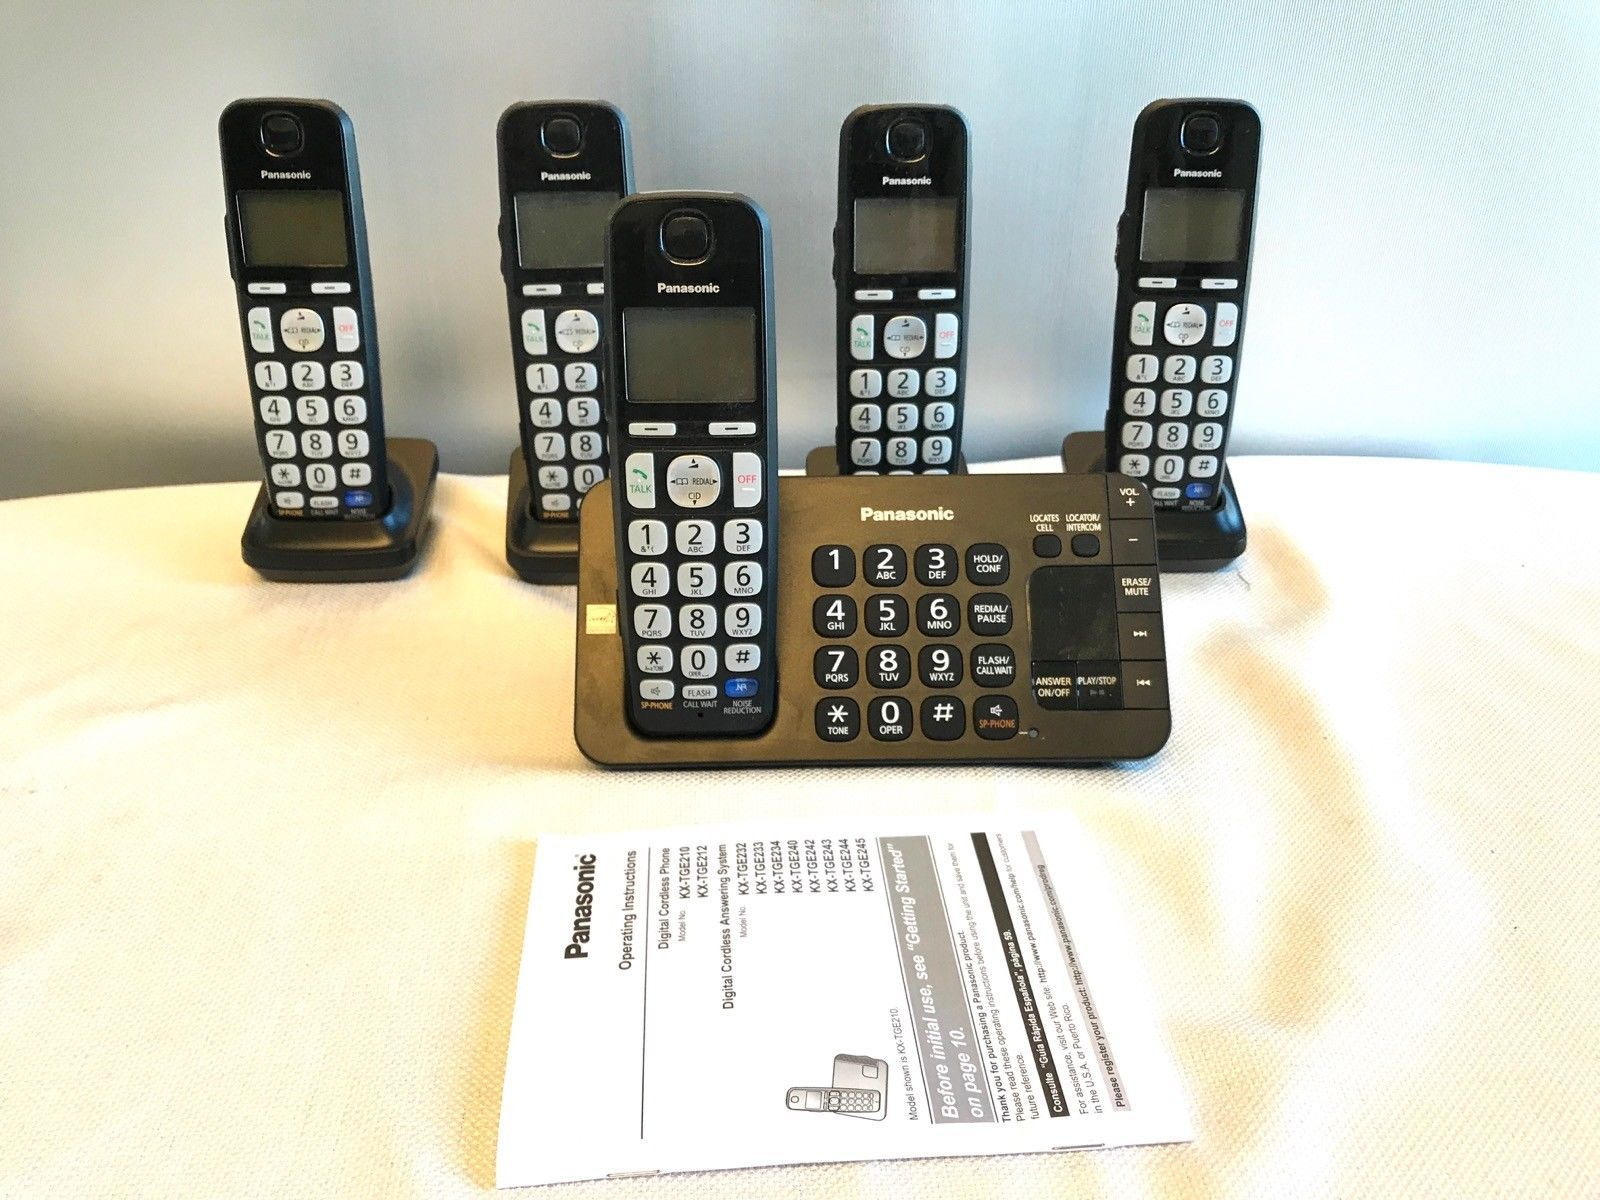 panasonic kx tge245 black cordless telephone and 50 similar items rh bonanza com Panasonic Kx Instruction Manual Panasonic Kx Instruction Manual